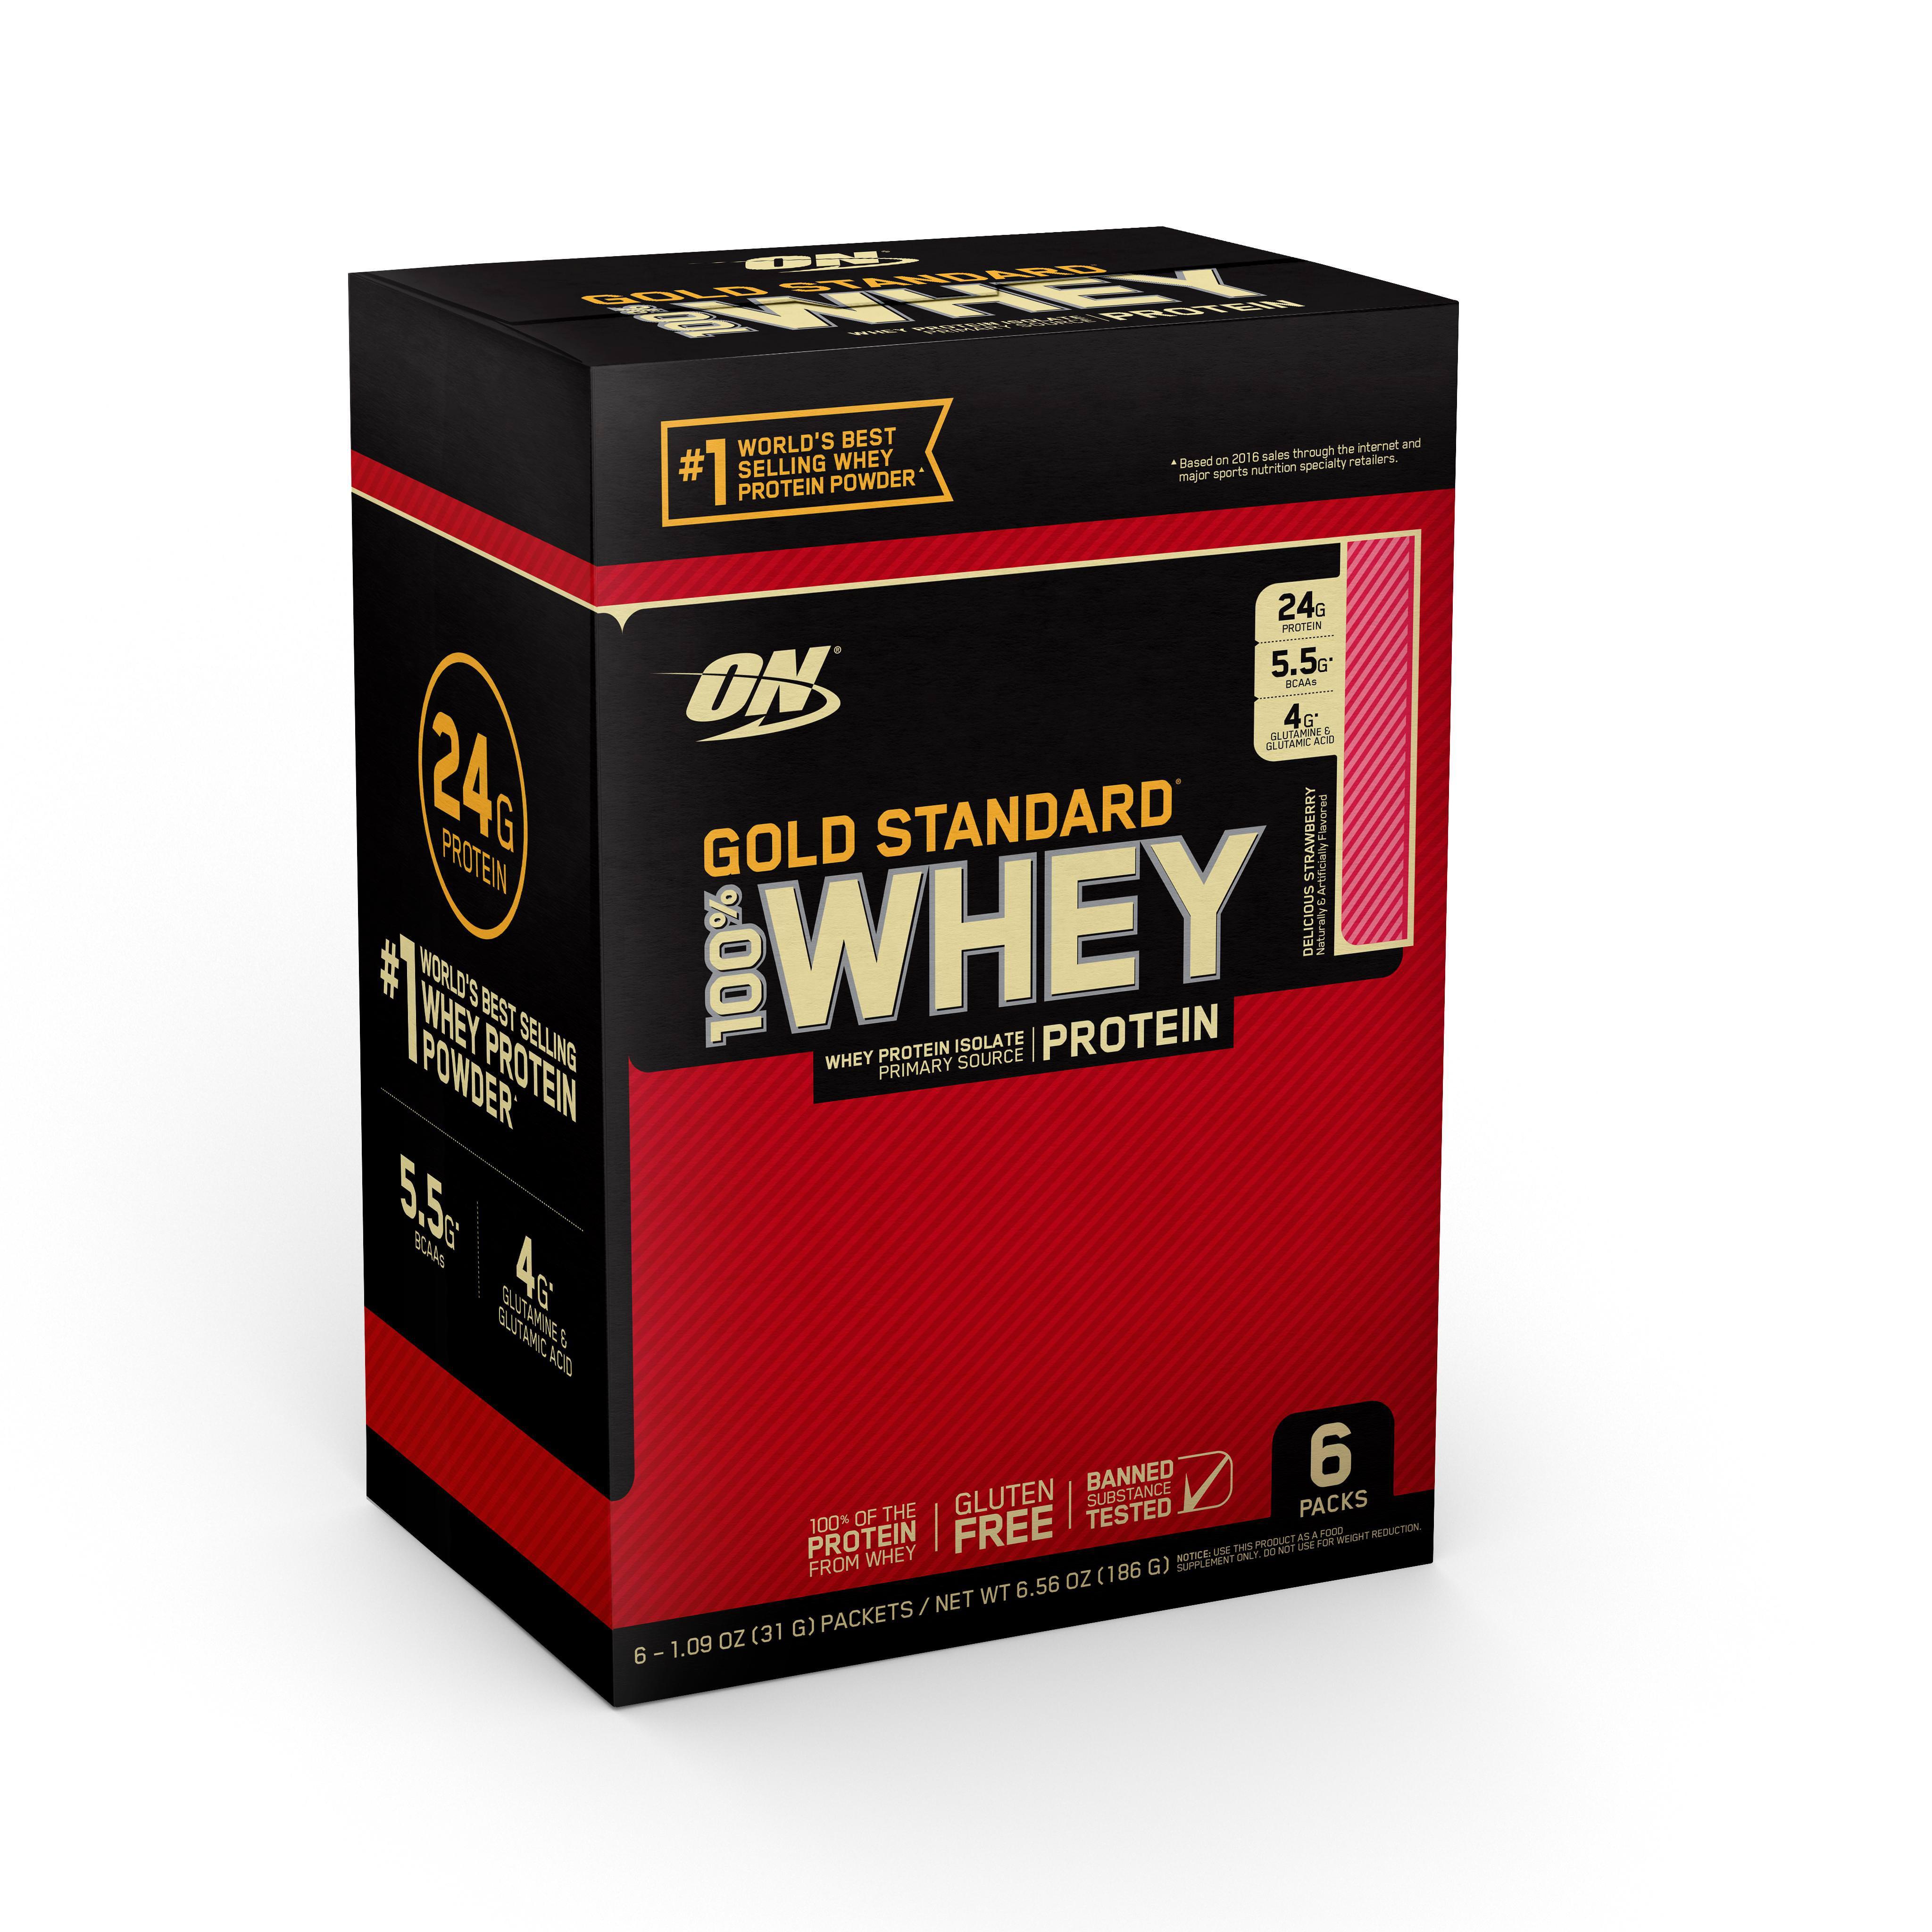 Optimum Nutrition Gold Standard 100% Whey Protein Powder, Delicious Strawberry, 24g Protein, 6 Count Sache